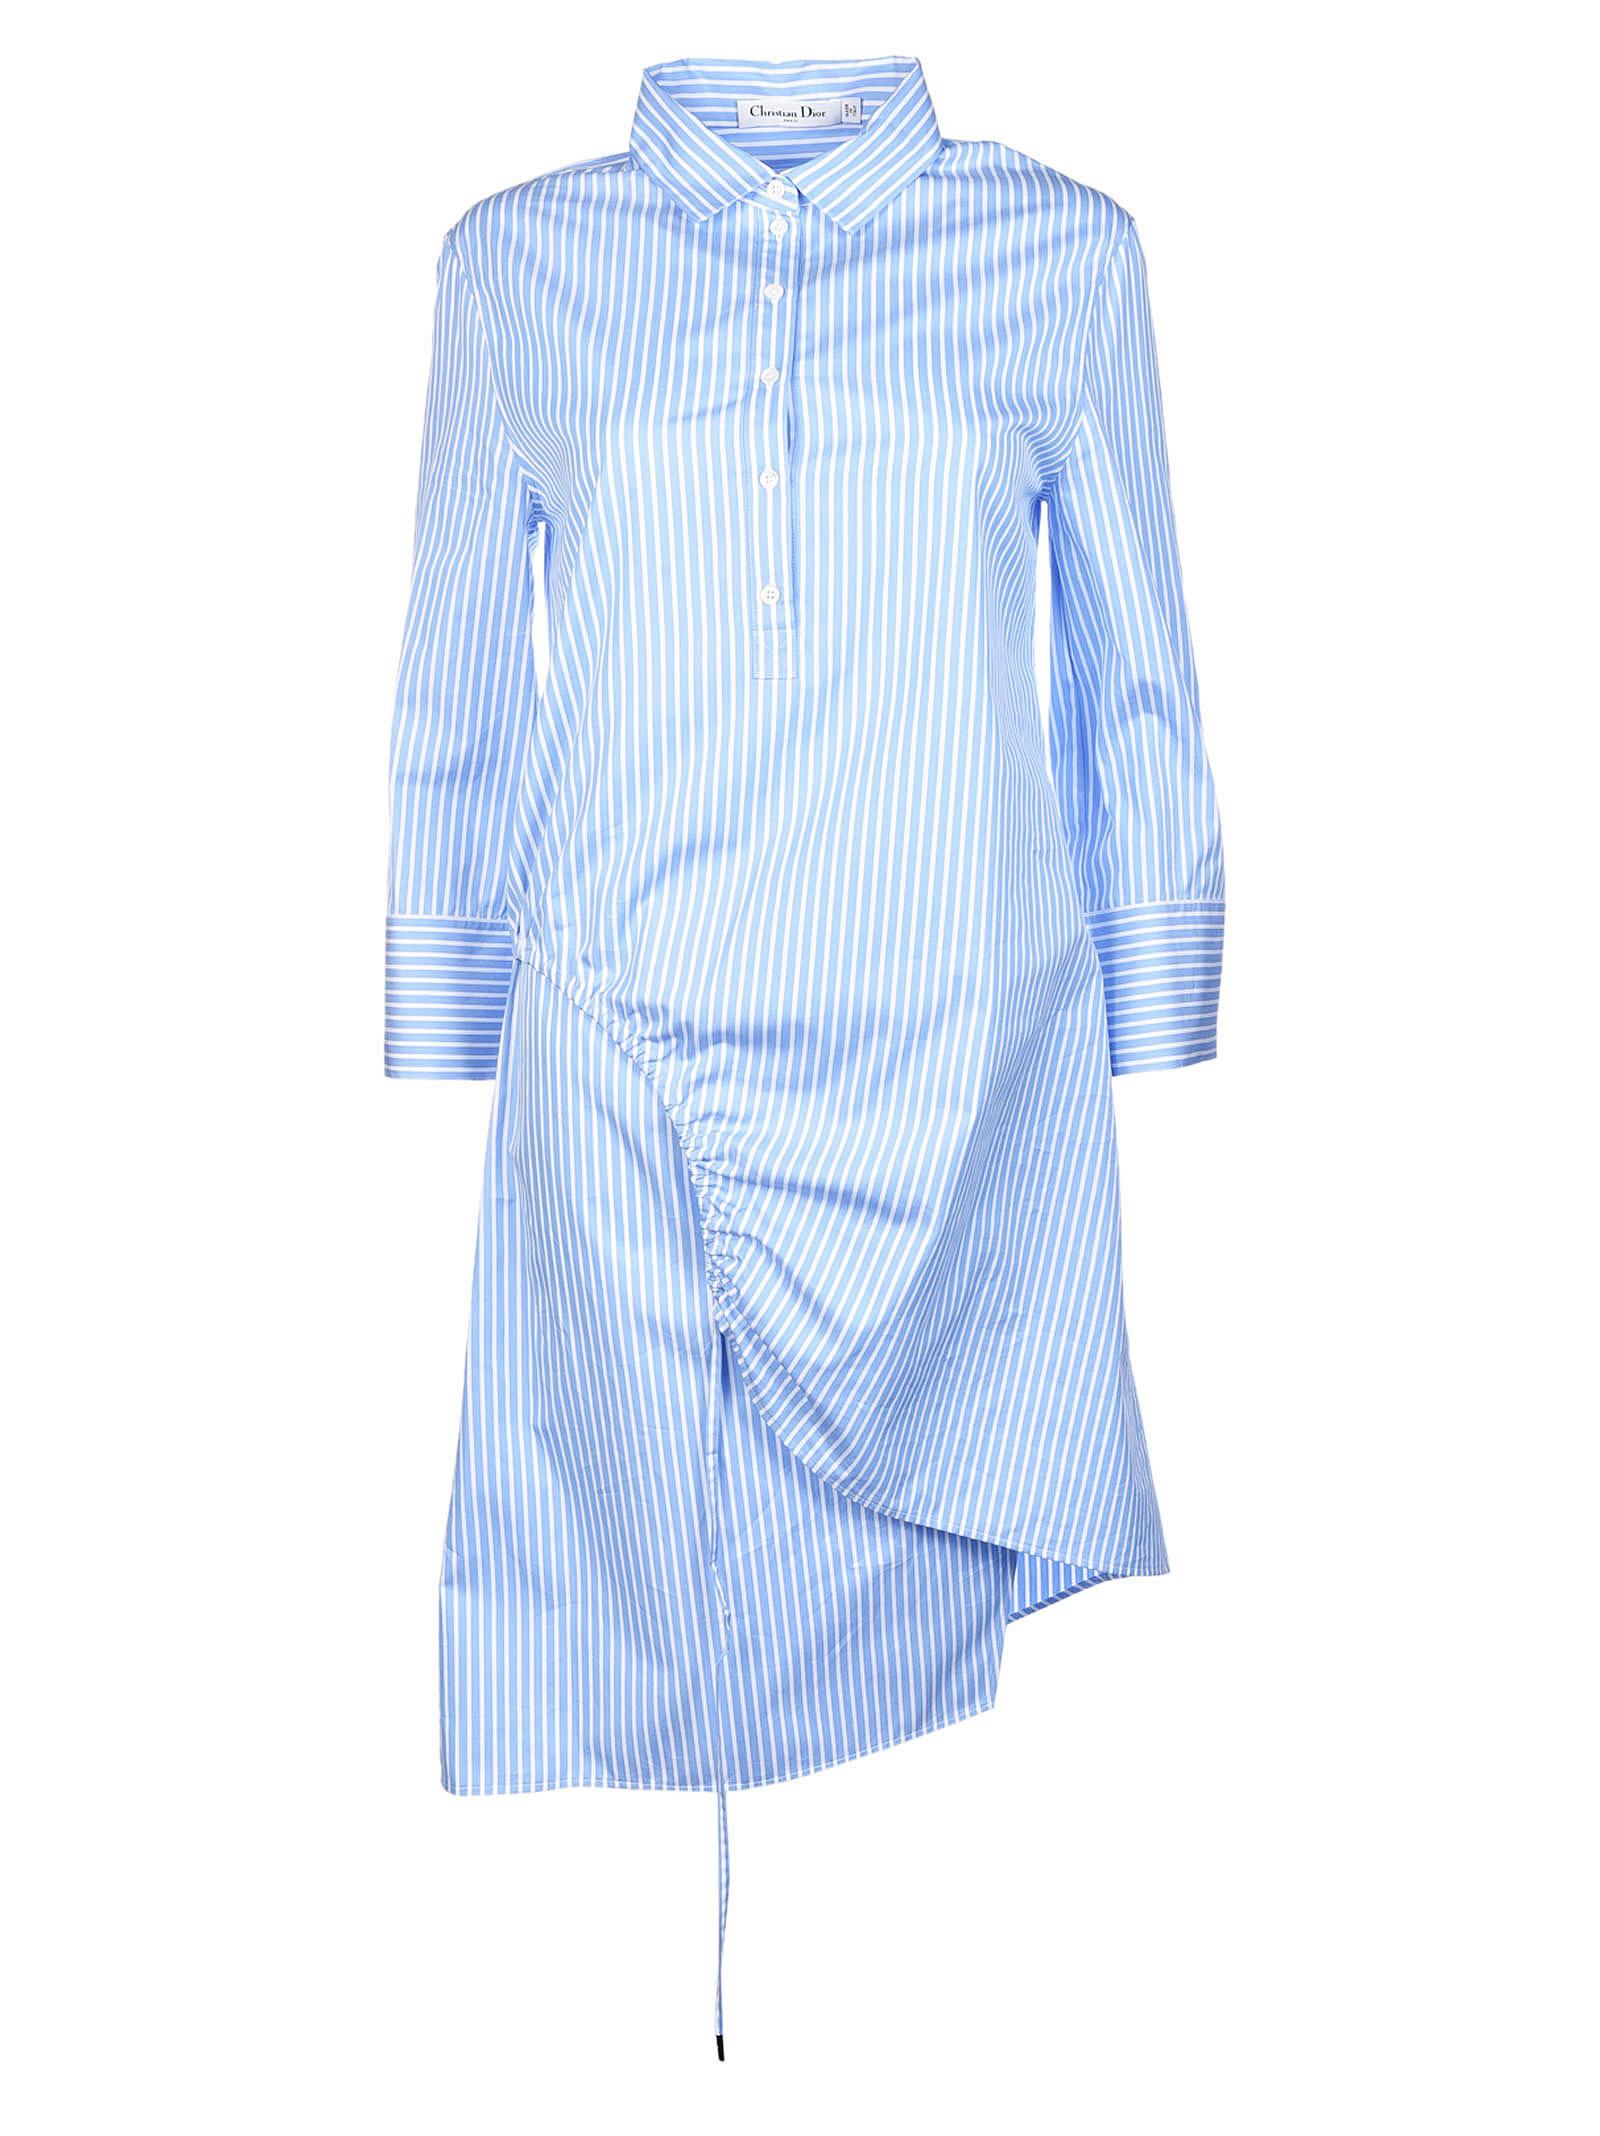 Christian Dior Striped Dress